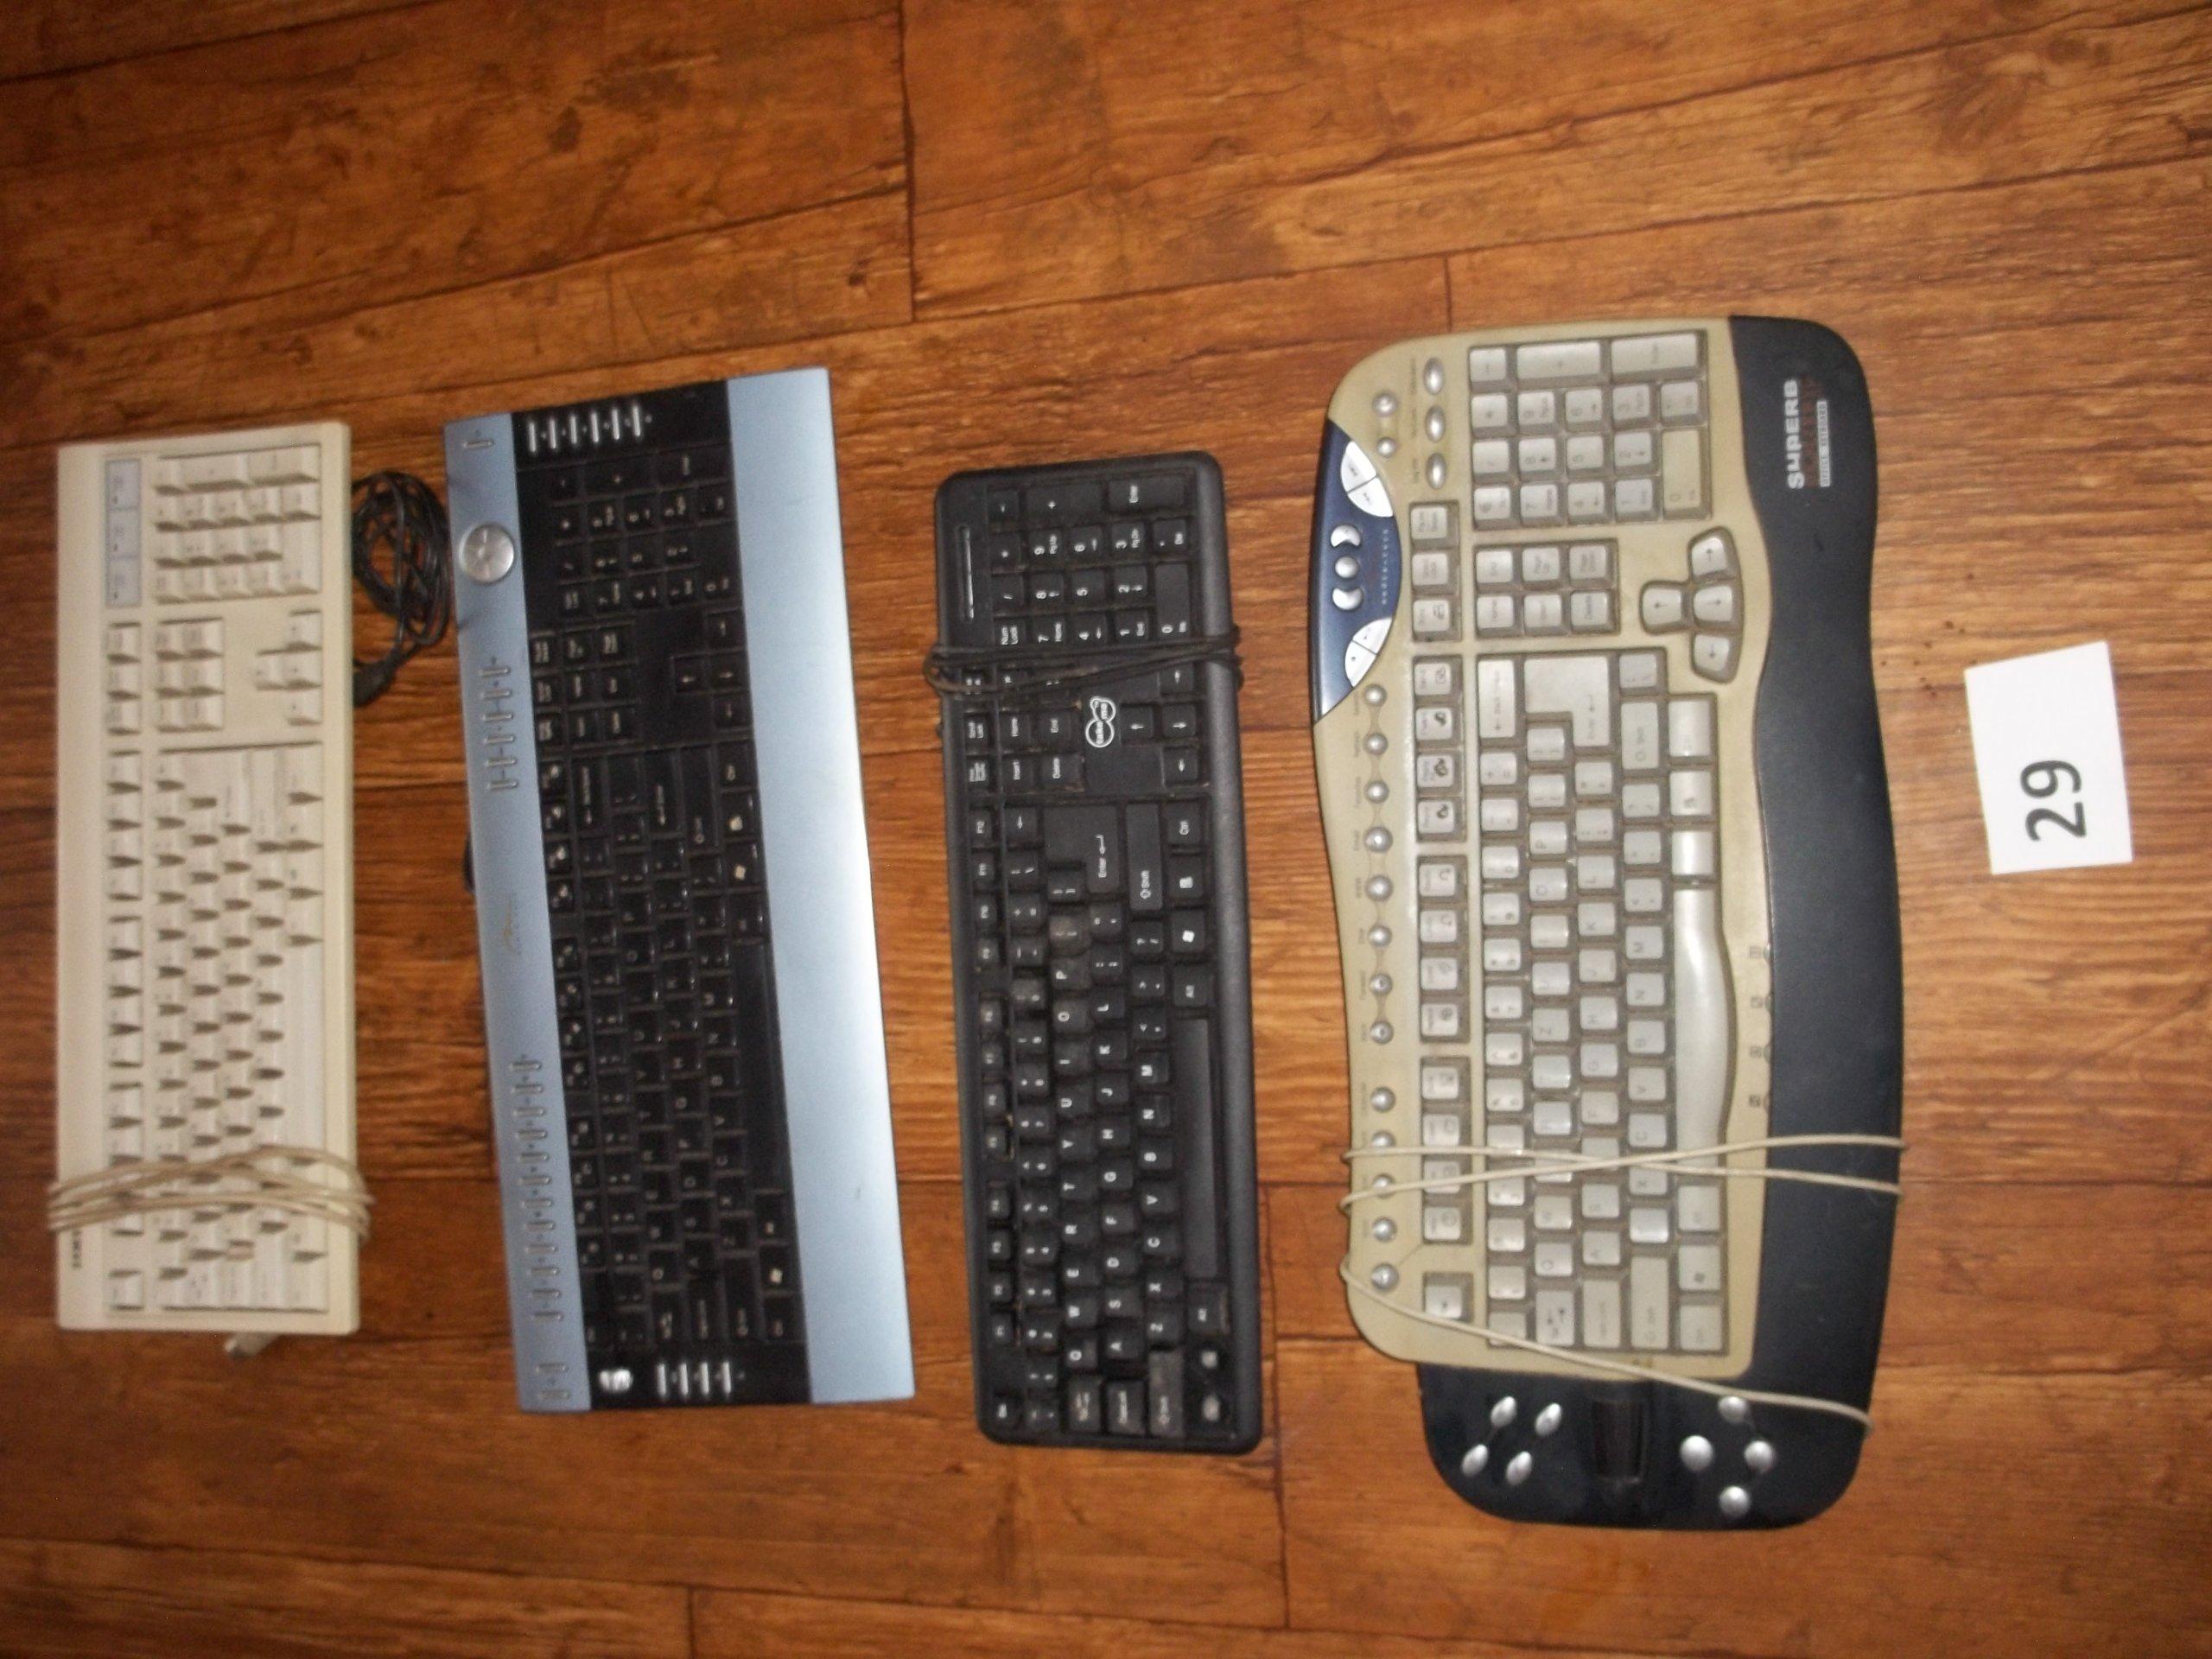 1b09082bbe ZESTAW mega paka klawiatura klawiatury 4 SZT (29) - 7380133979 ...